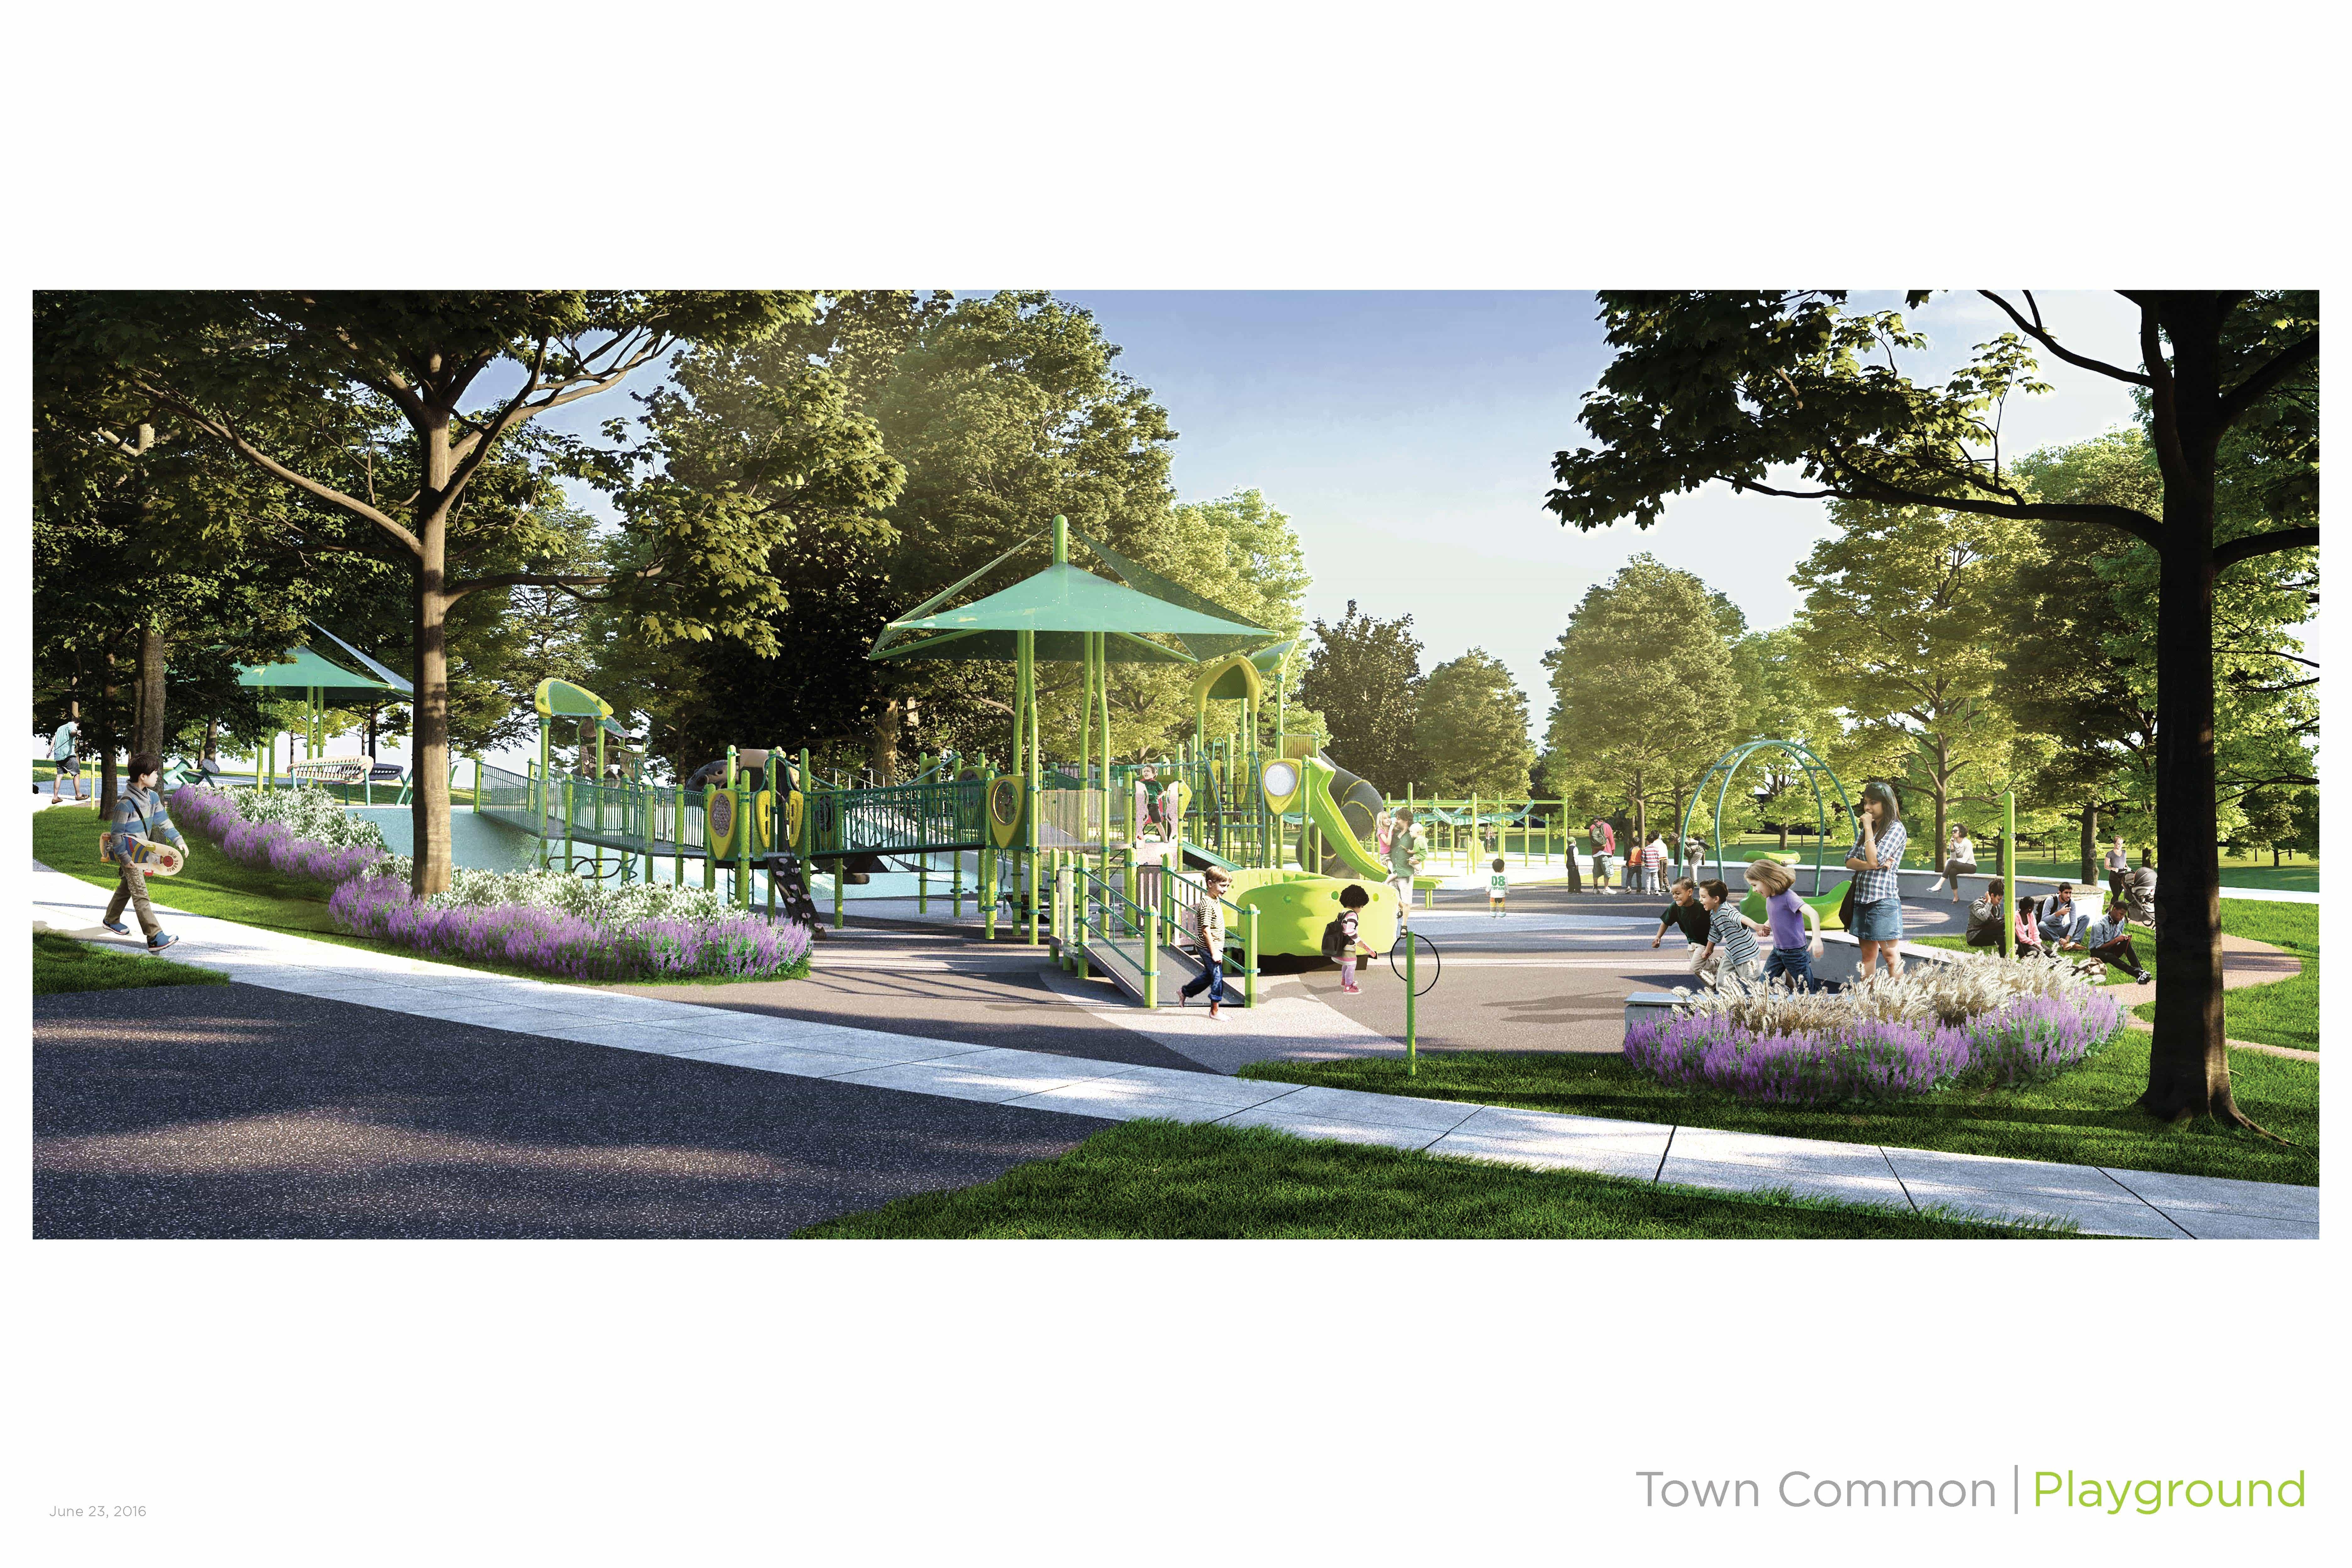 Town Common Playground photo